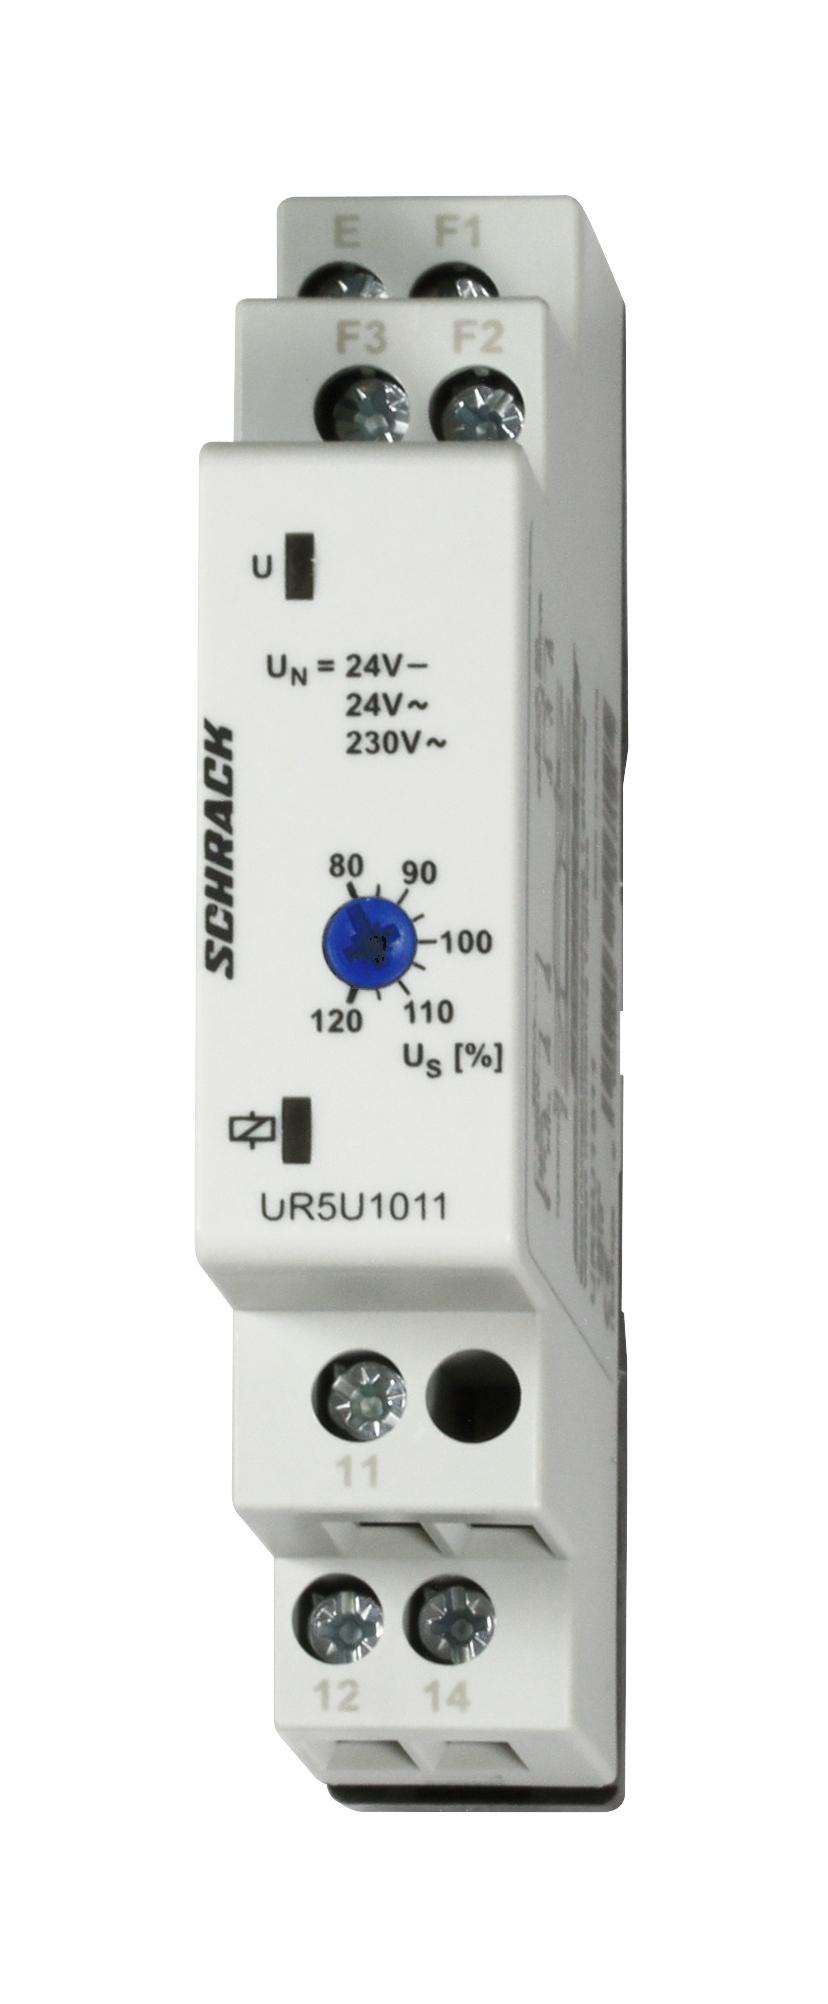 UR5U1011 - Schrack Technik